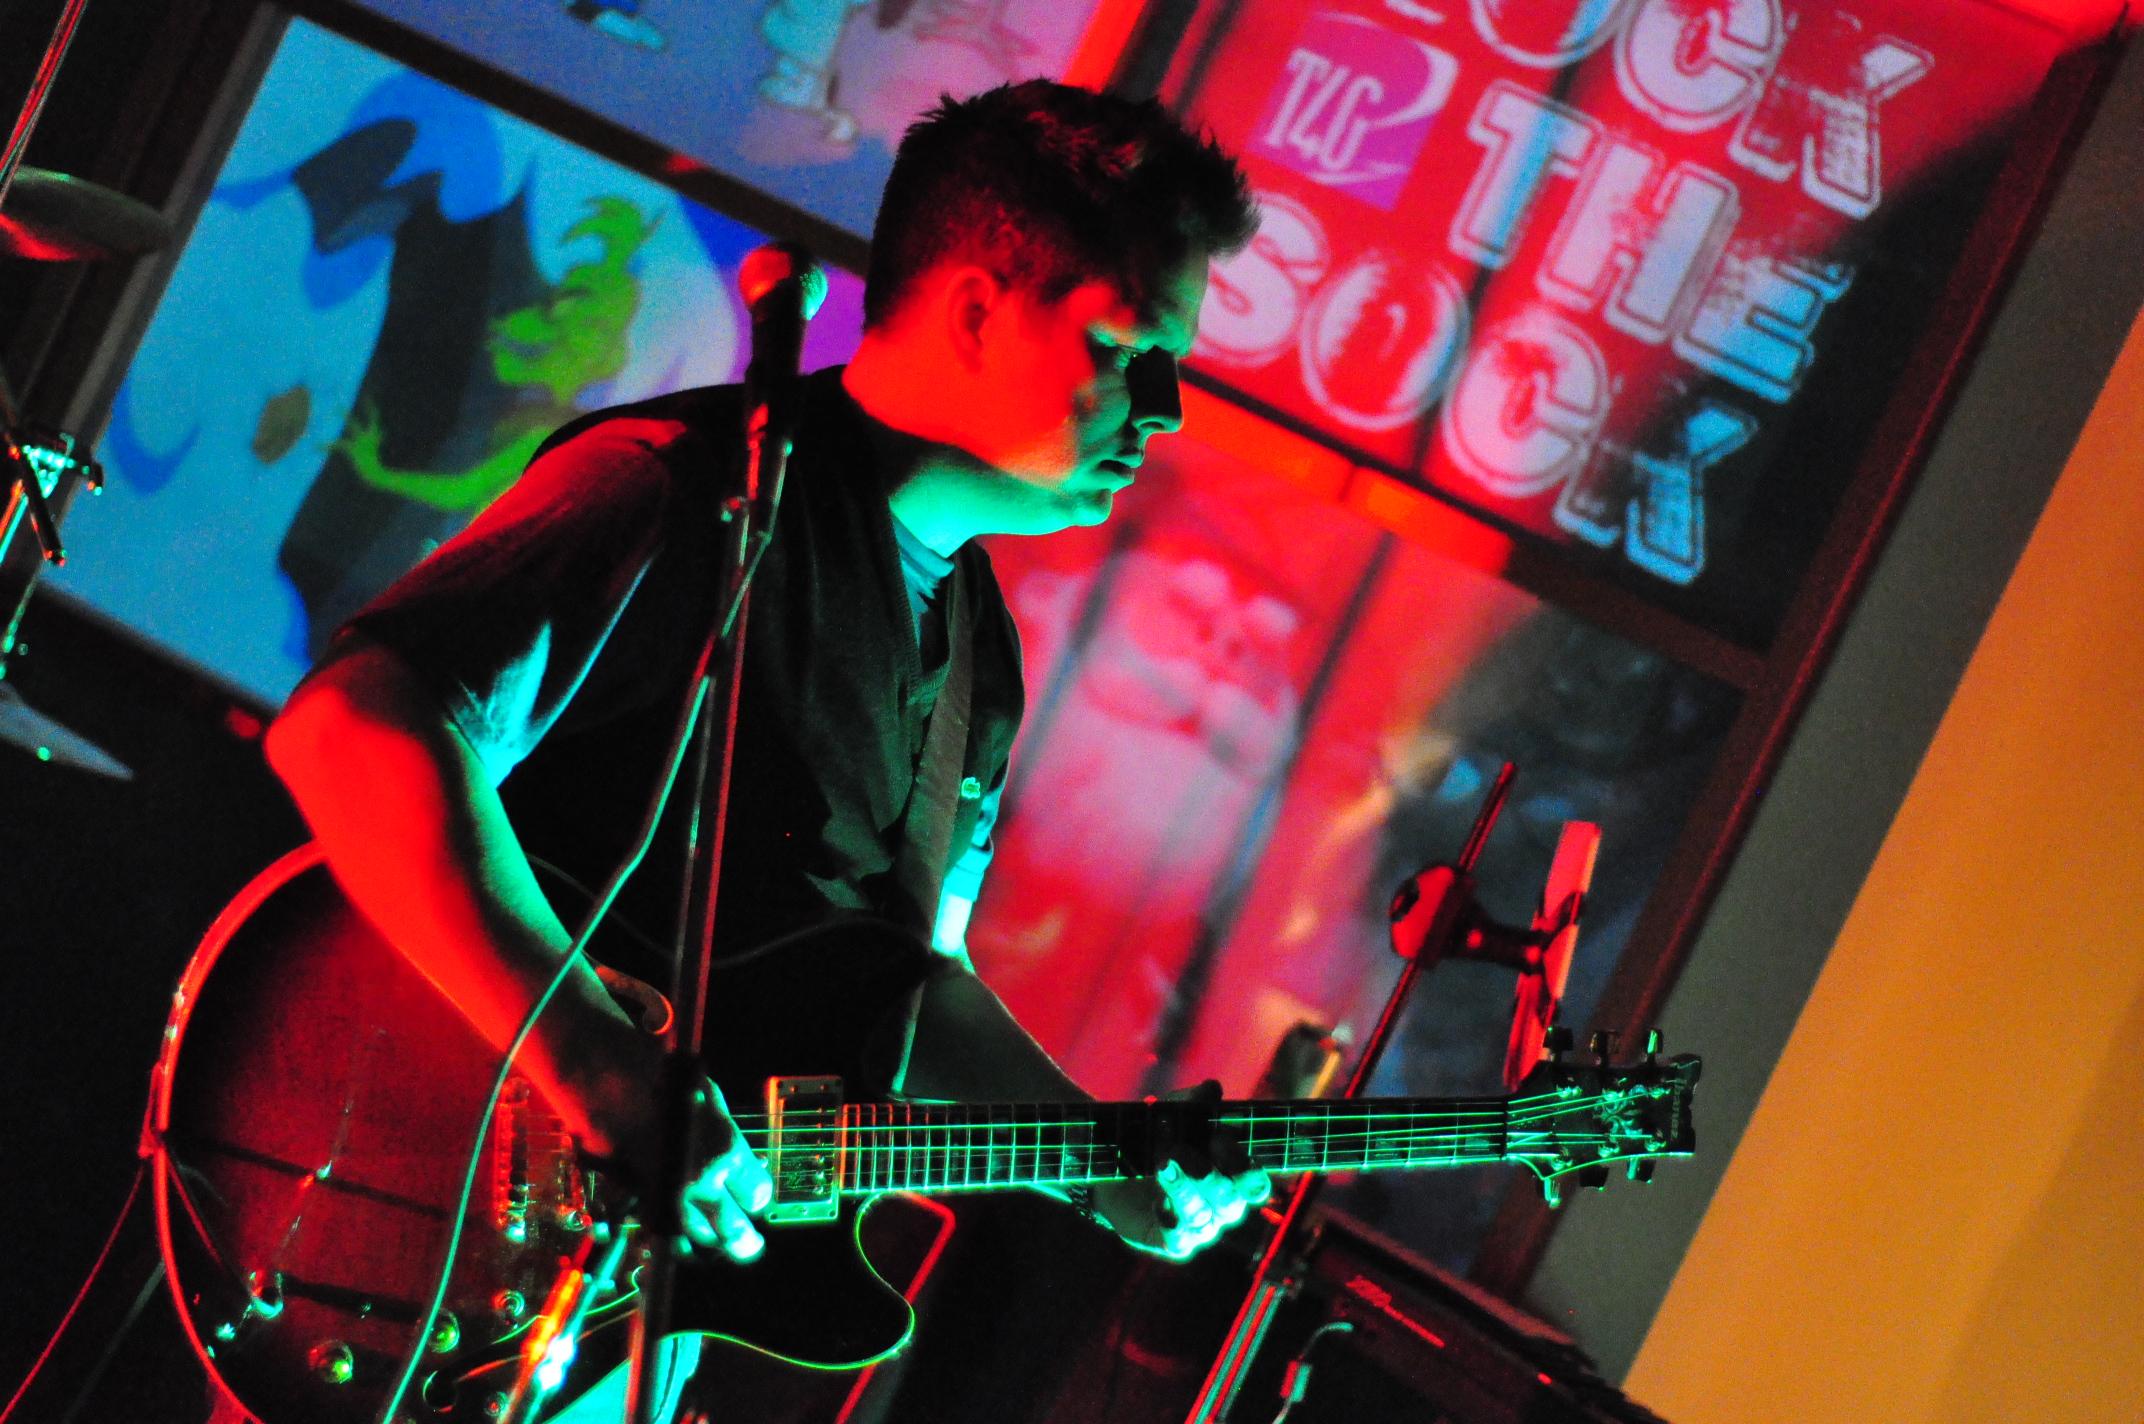 Shaner's Guitar Face